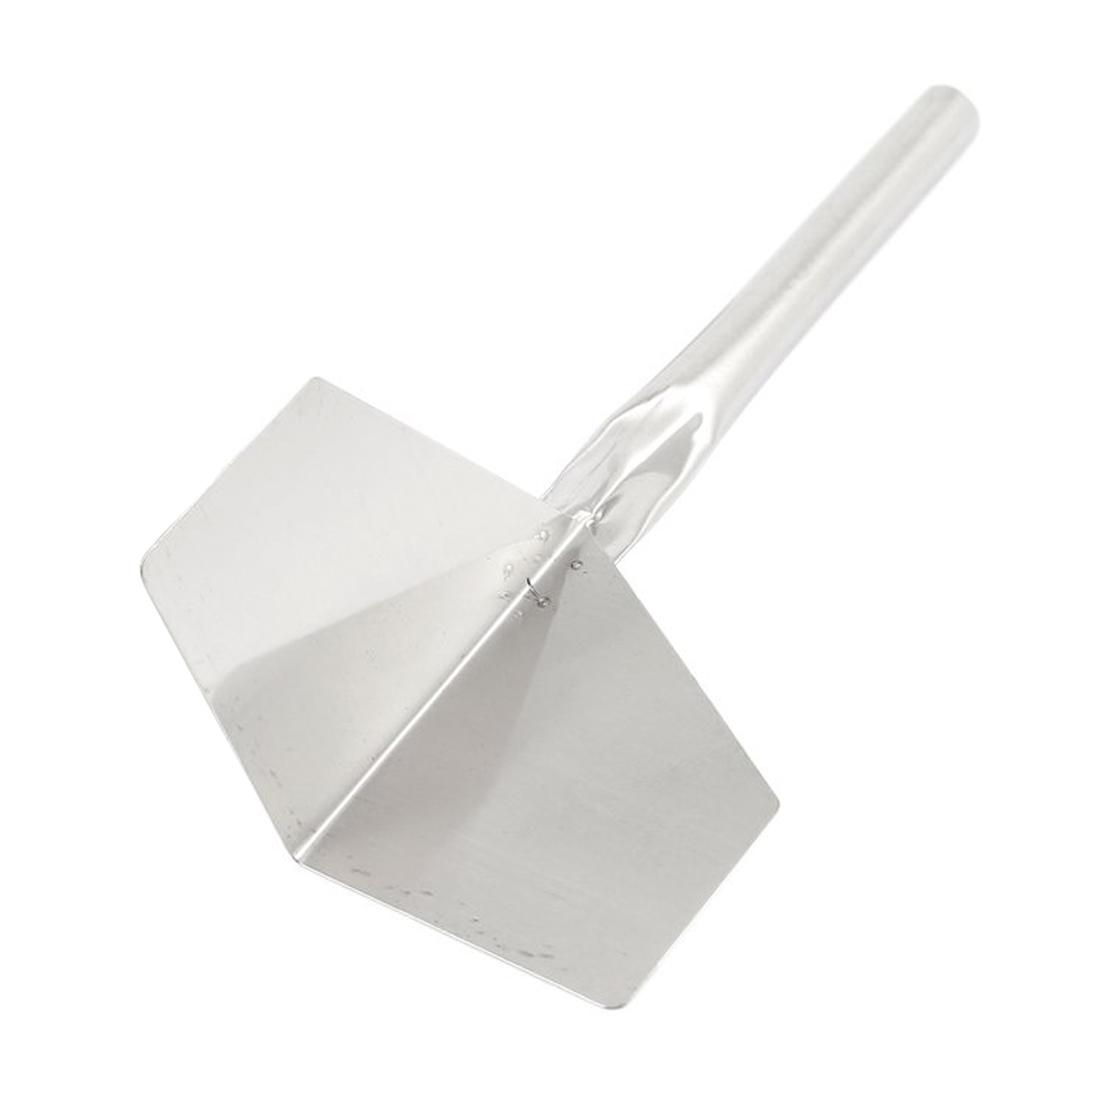 EWS Wholesale Garden Metal Handle 90 Degree Drywall Outside Corner Trowels 5 Pcs<br><br>Aliexpress